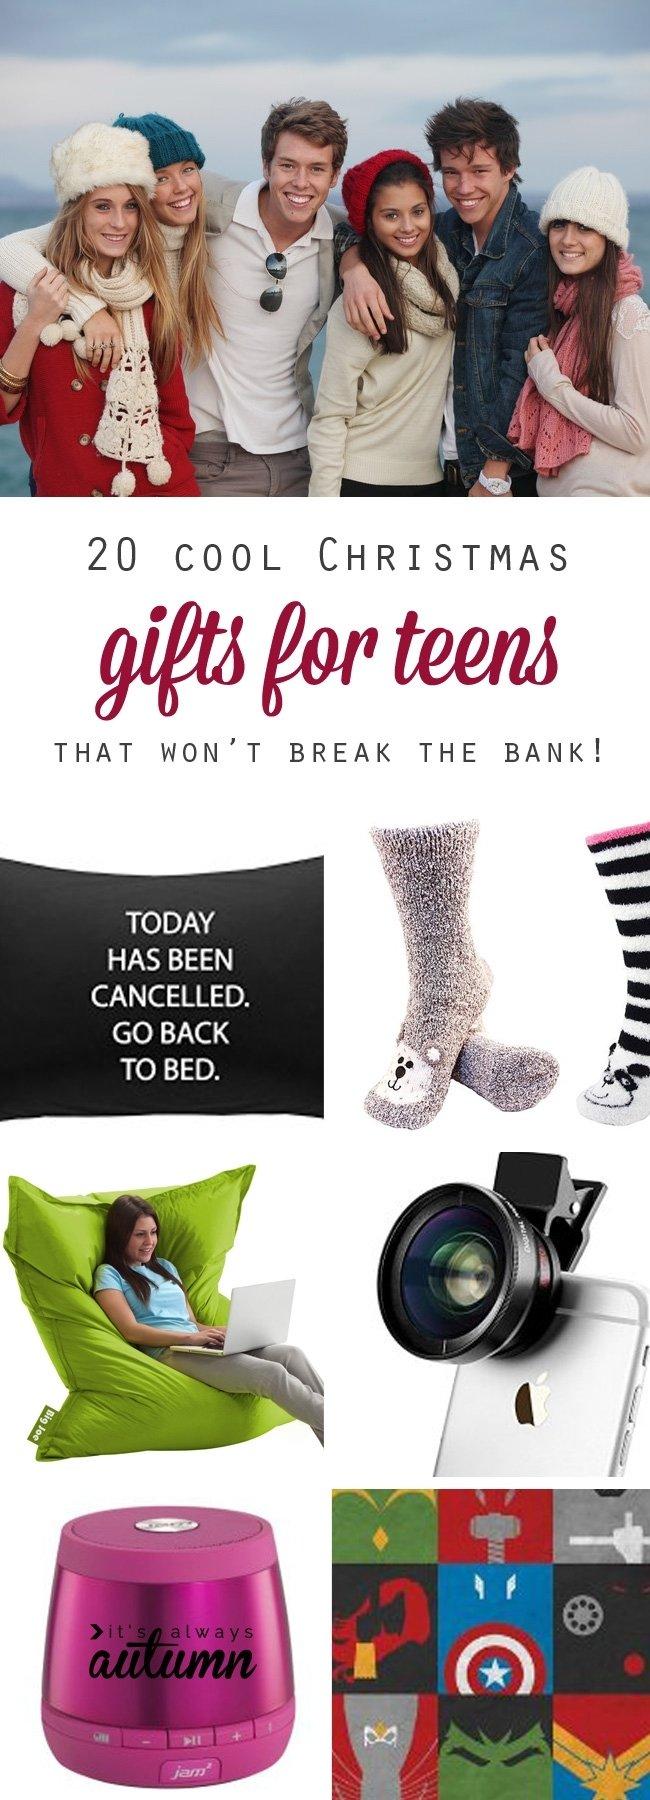 10 Beautiful Christmas Gift Ideas For Teen Girls best christmas gift ideas for teens its always autumn 6 2021